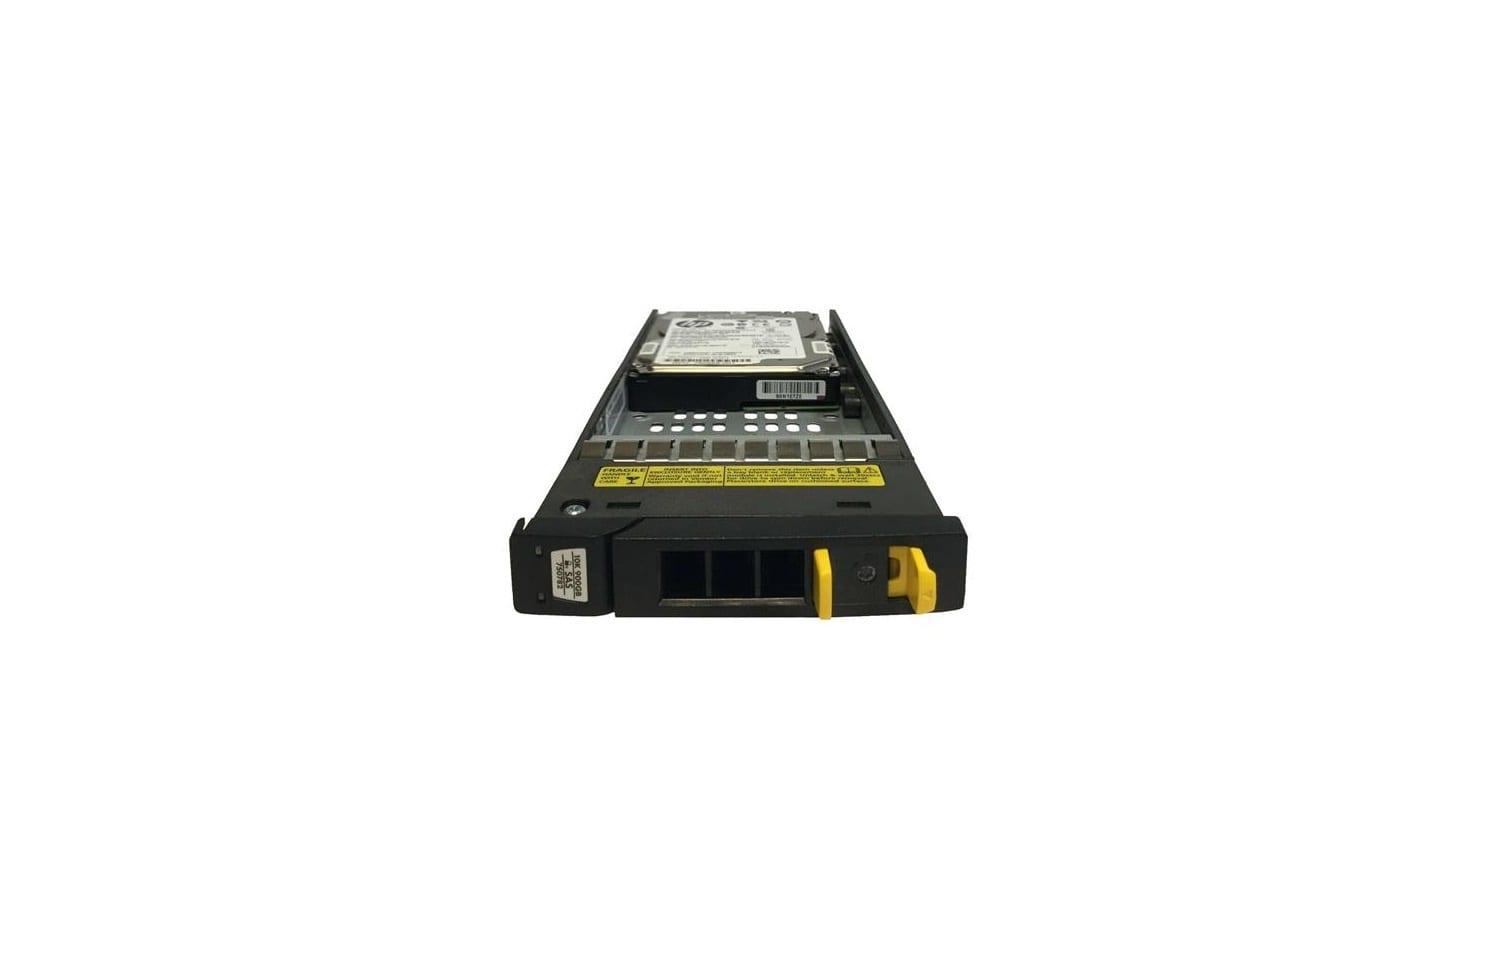 STBD3000100 Barracuda 3TB 7.2K RPM 7Pin SATA Hard Drive